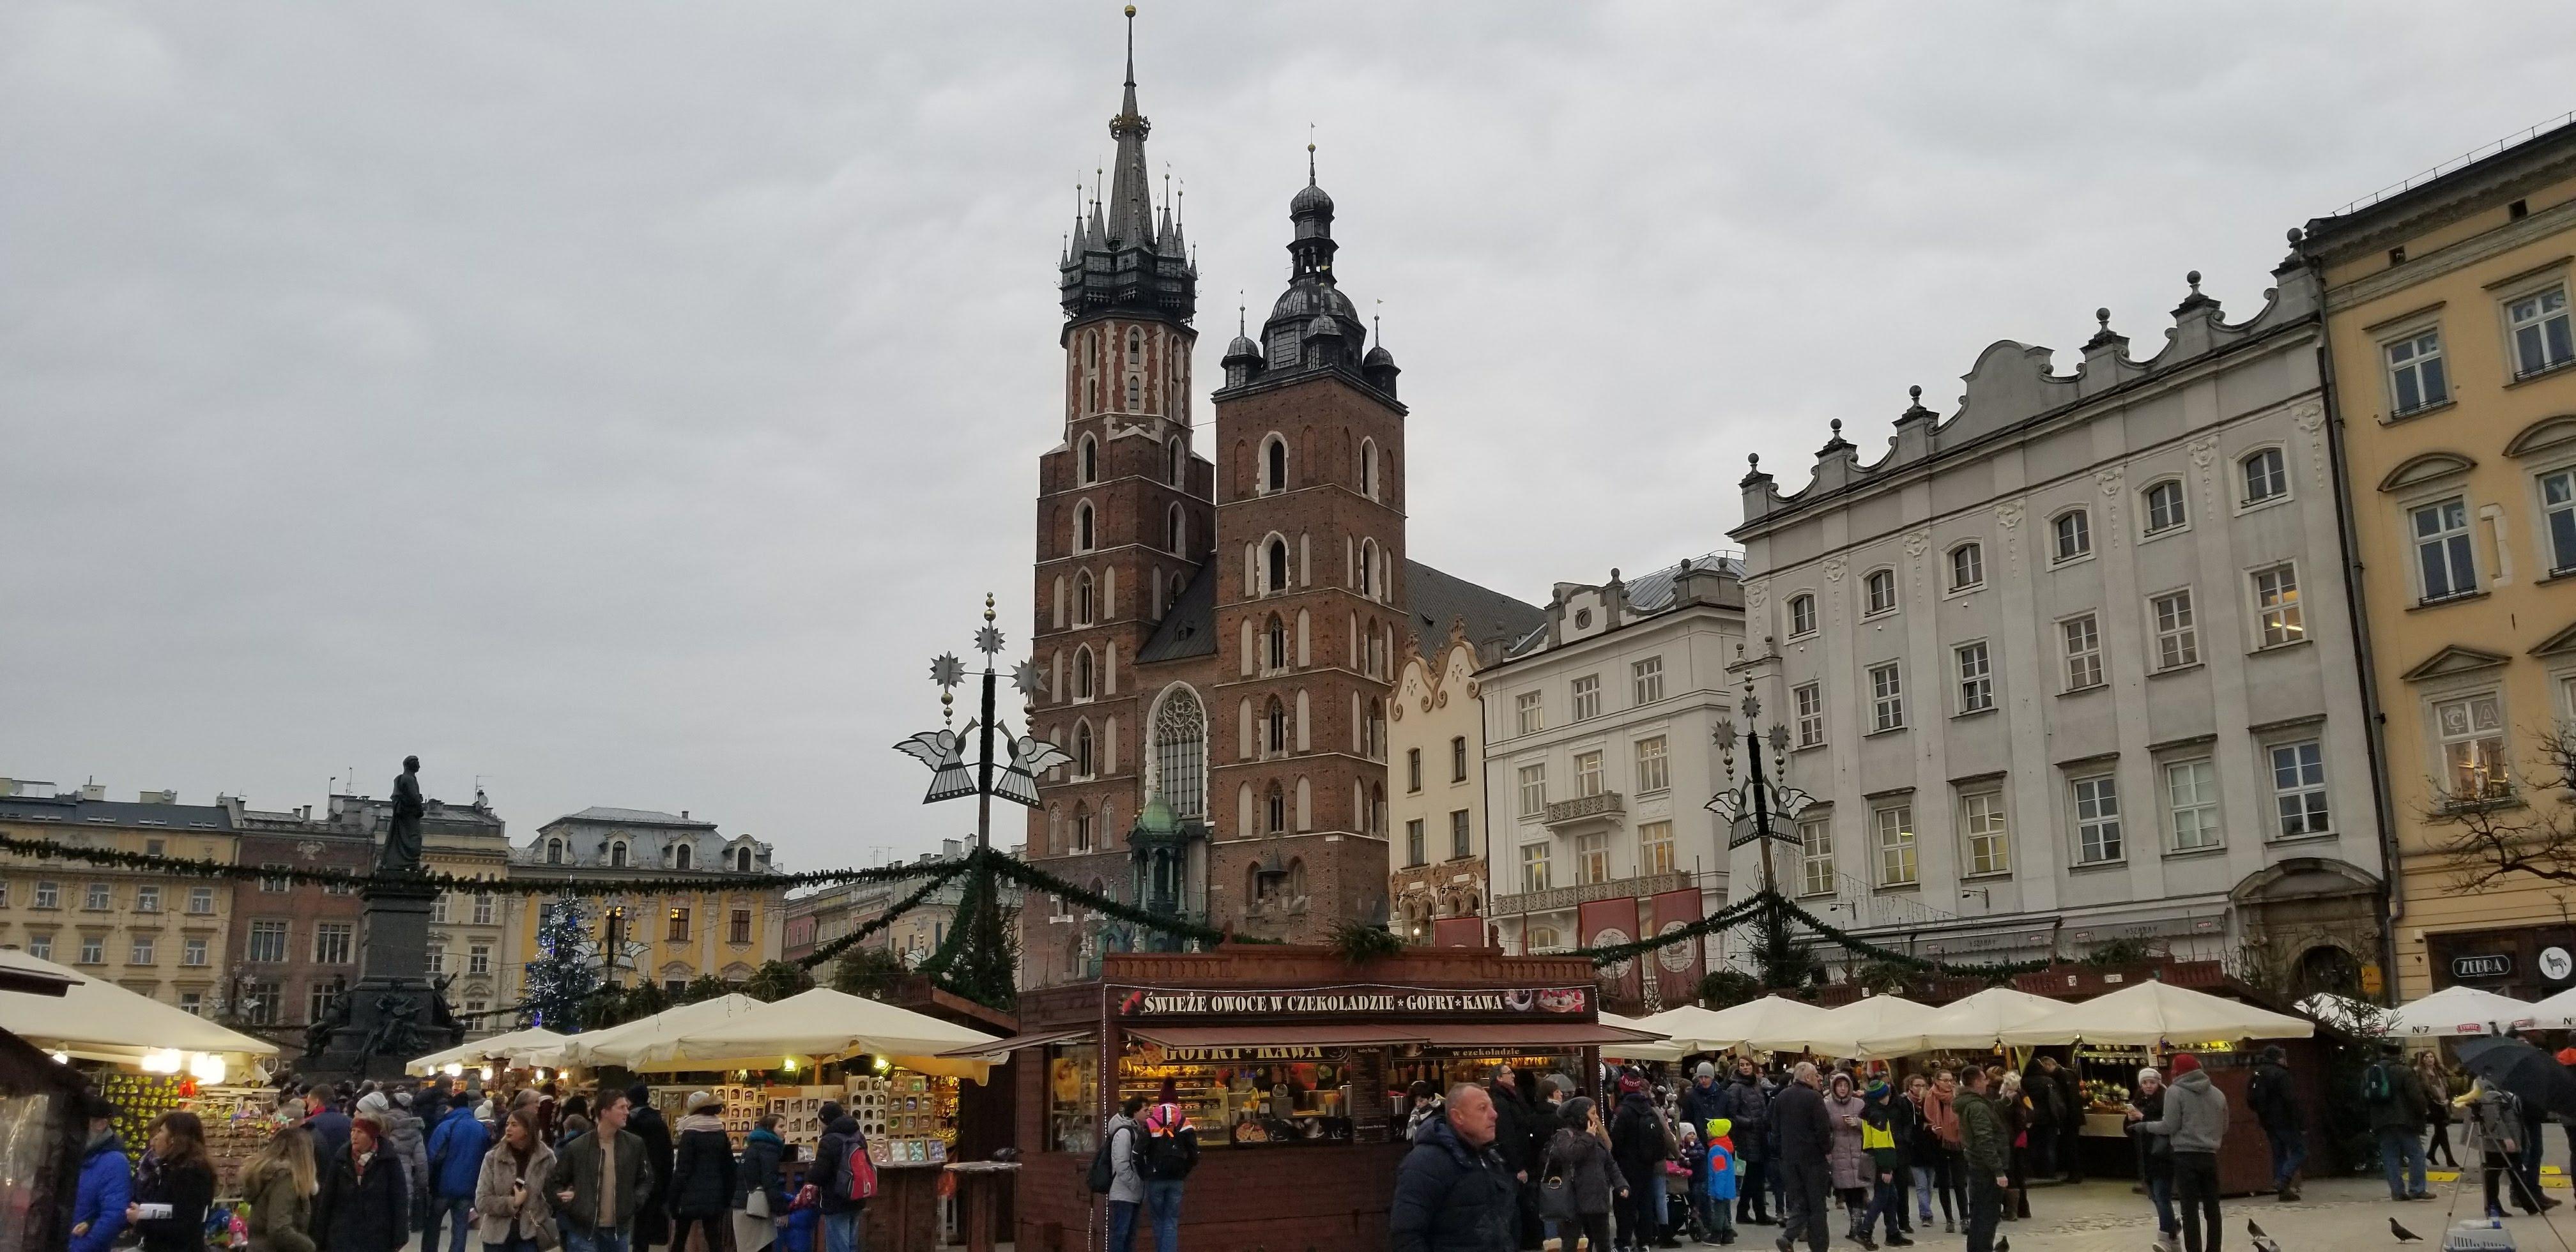 CAPAStudyAbroad_London_Fall2017_From Thaddeus Kaszuba - Christmas Market in Krakow Old Town in Poland.jpg